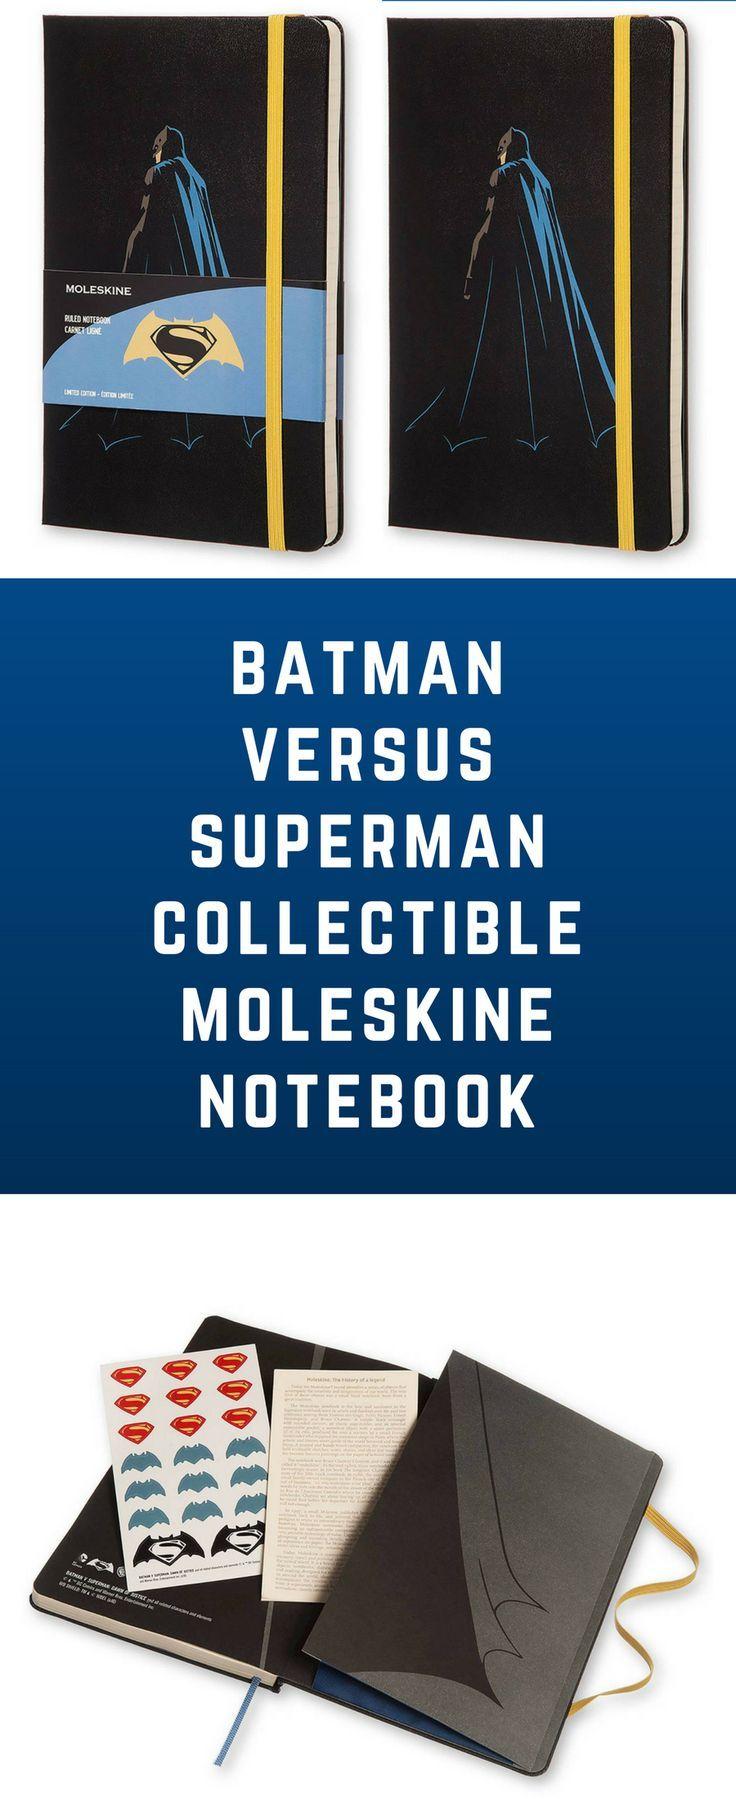 Limited edition Batman versus Superman Moleskine notebook with bonus sticker sheet. #moleskine #batman #superman #batmanvssuperman #batmanversussuperman #notebook #bulletjournal #journal #gift #giftidea #affiliate